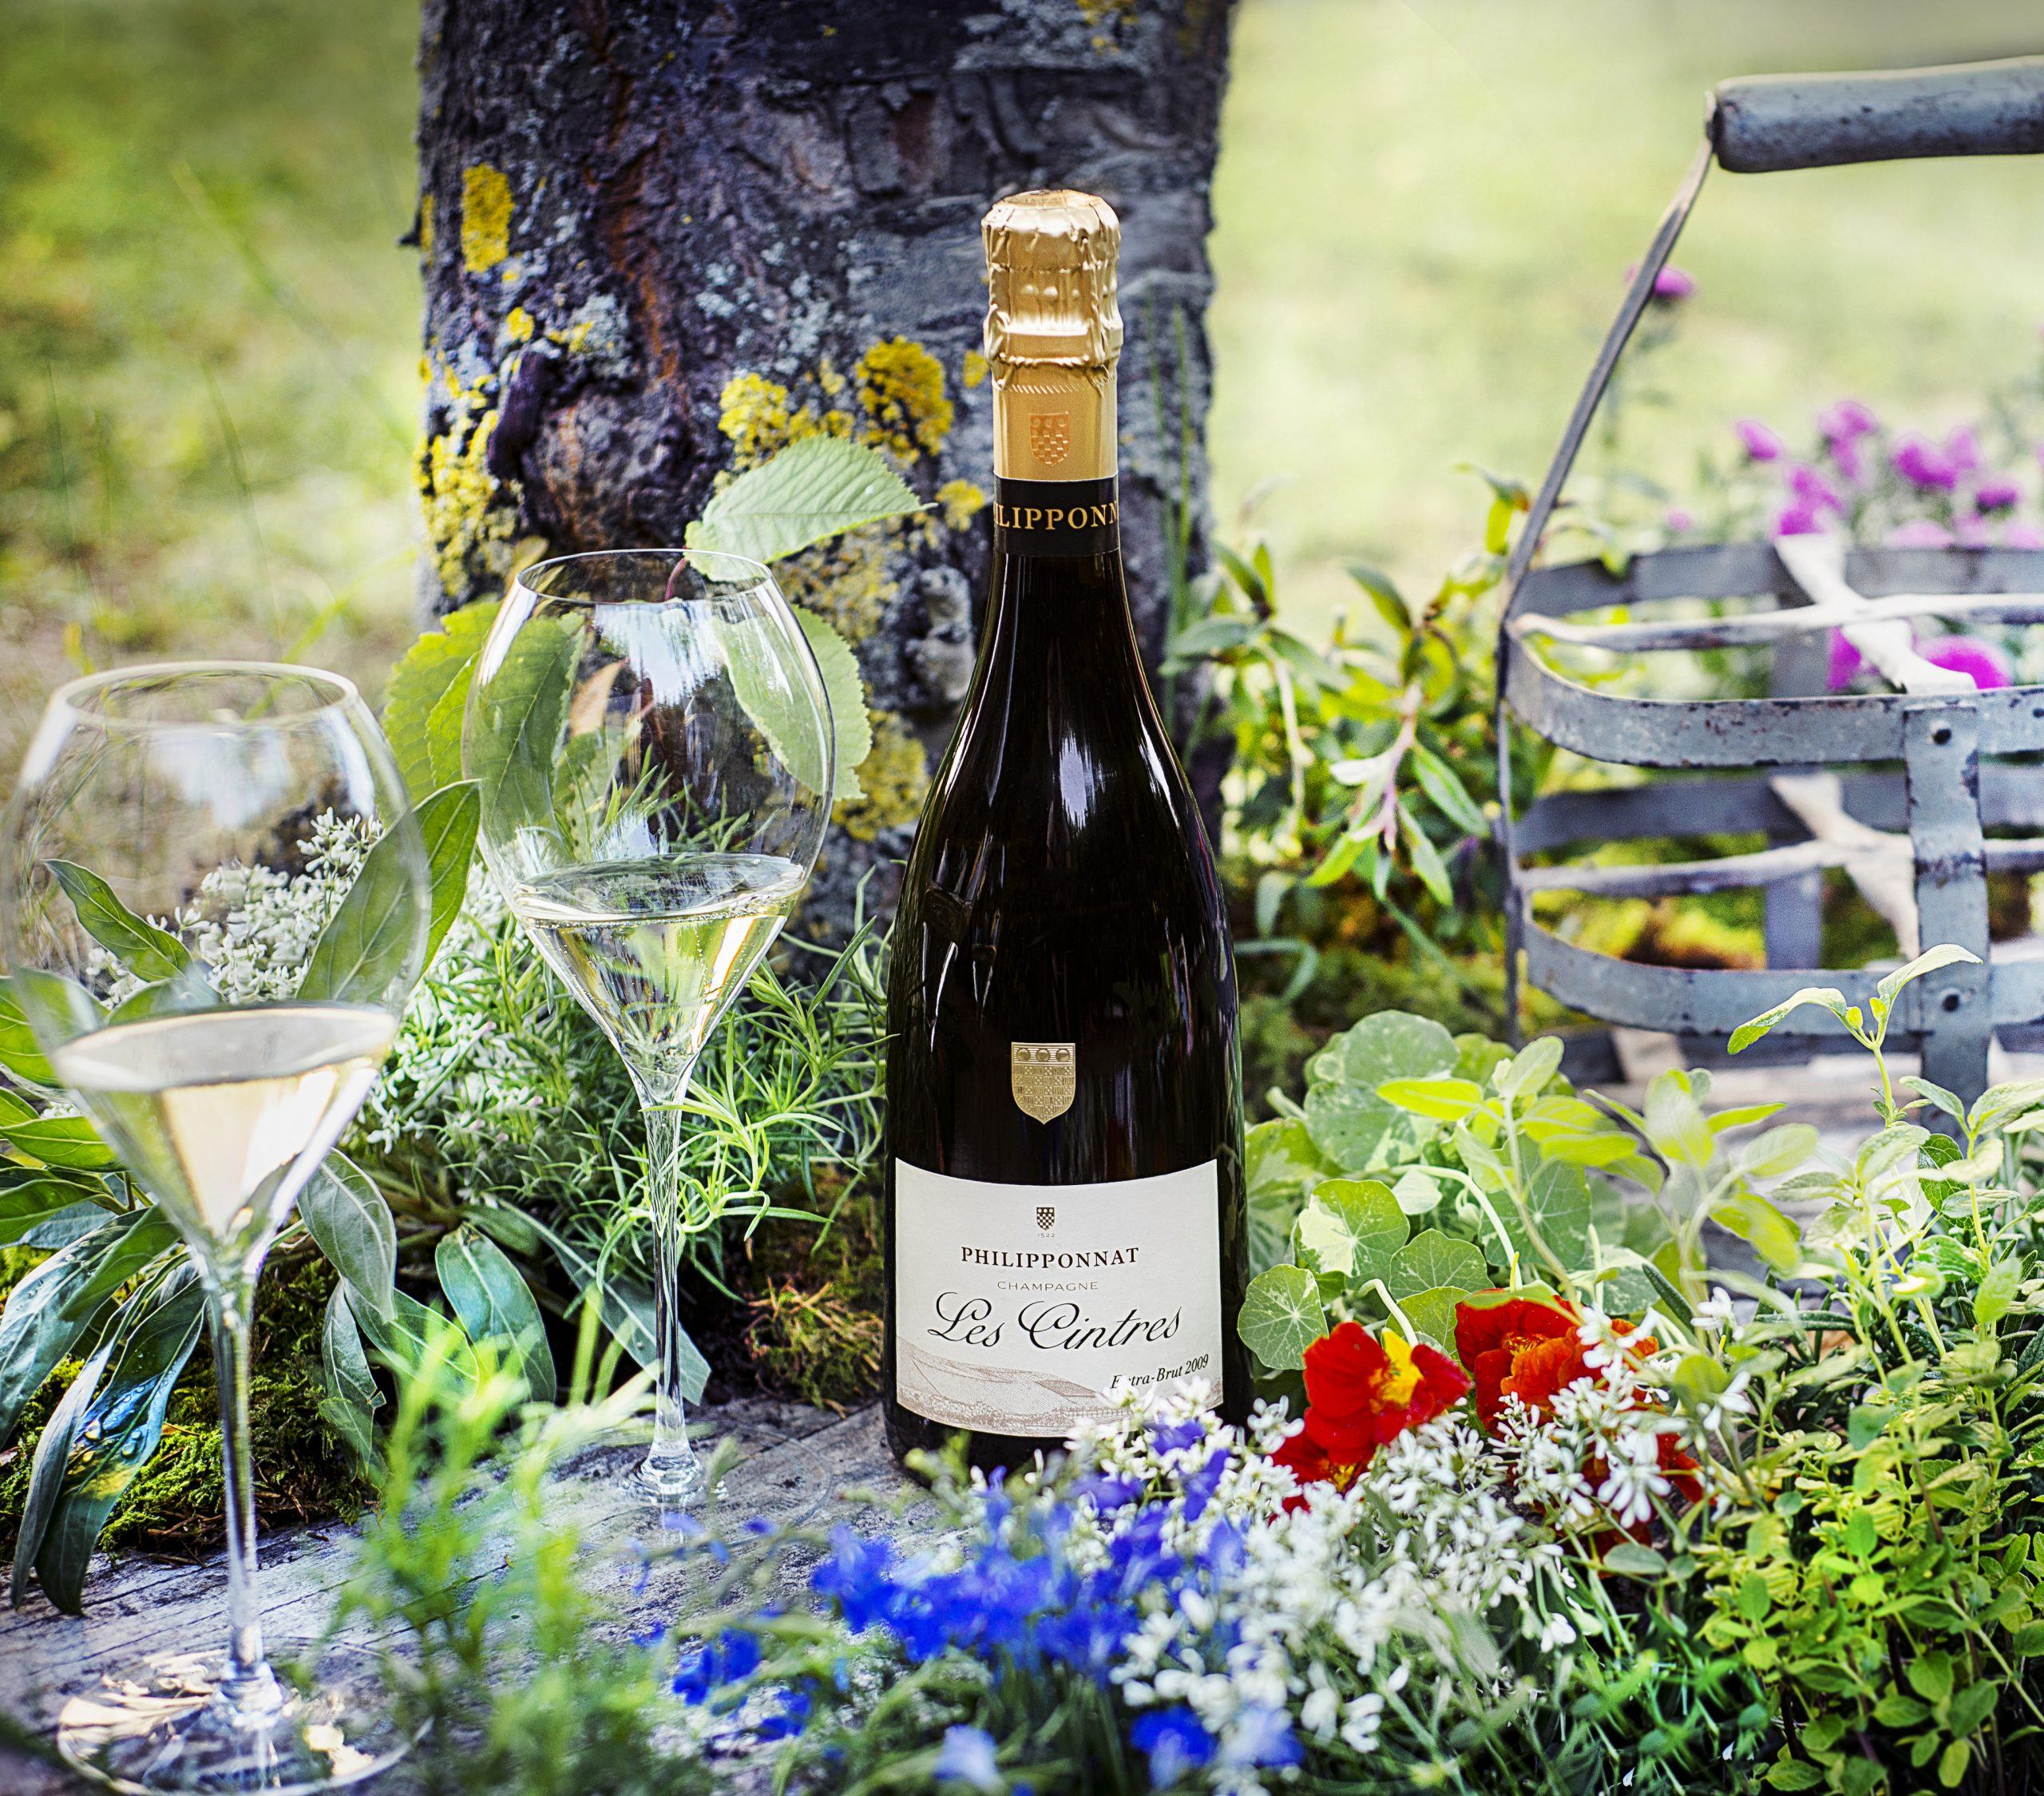 Les Cintres Extra Brut 2009 - Champagne Philipponnat